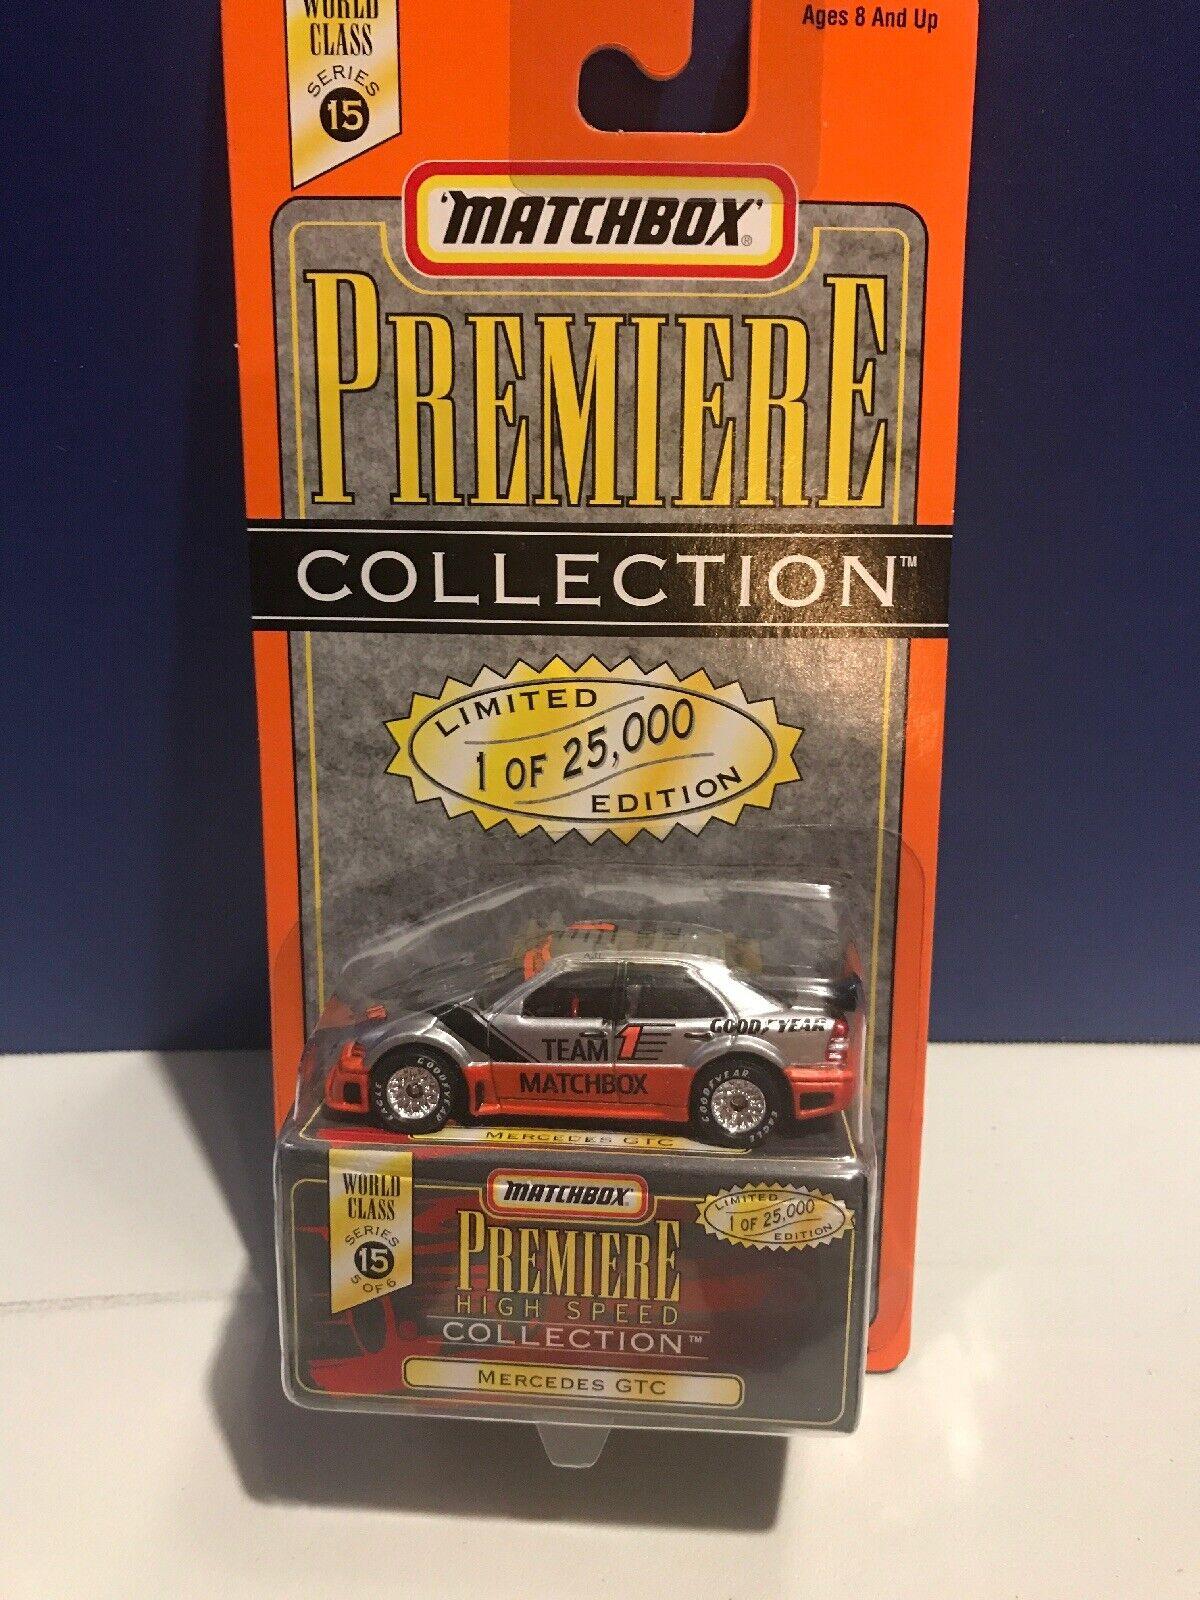 Matchbox Premiere Collection 1 64 64 64  1 of 25,000 World Class Bundle. Nissan 300zx. 988ab5